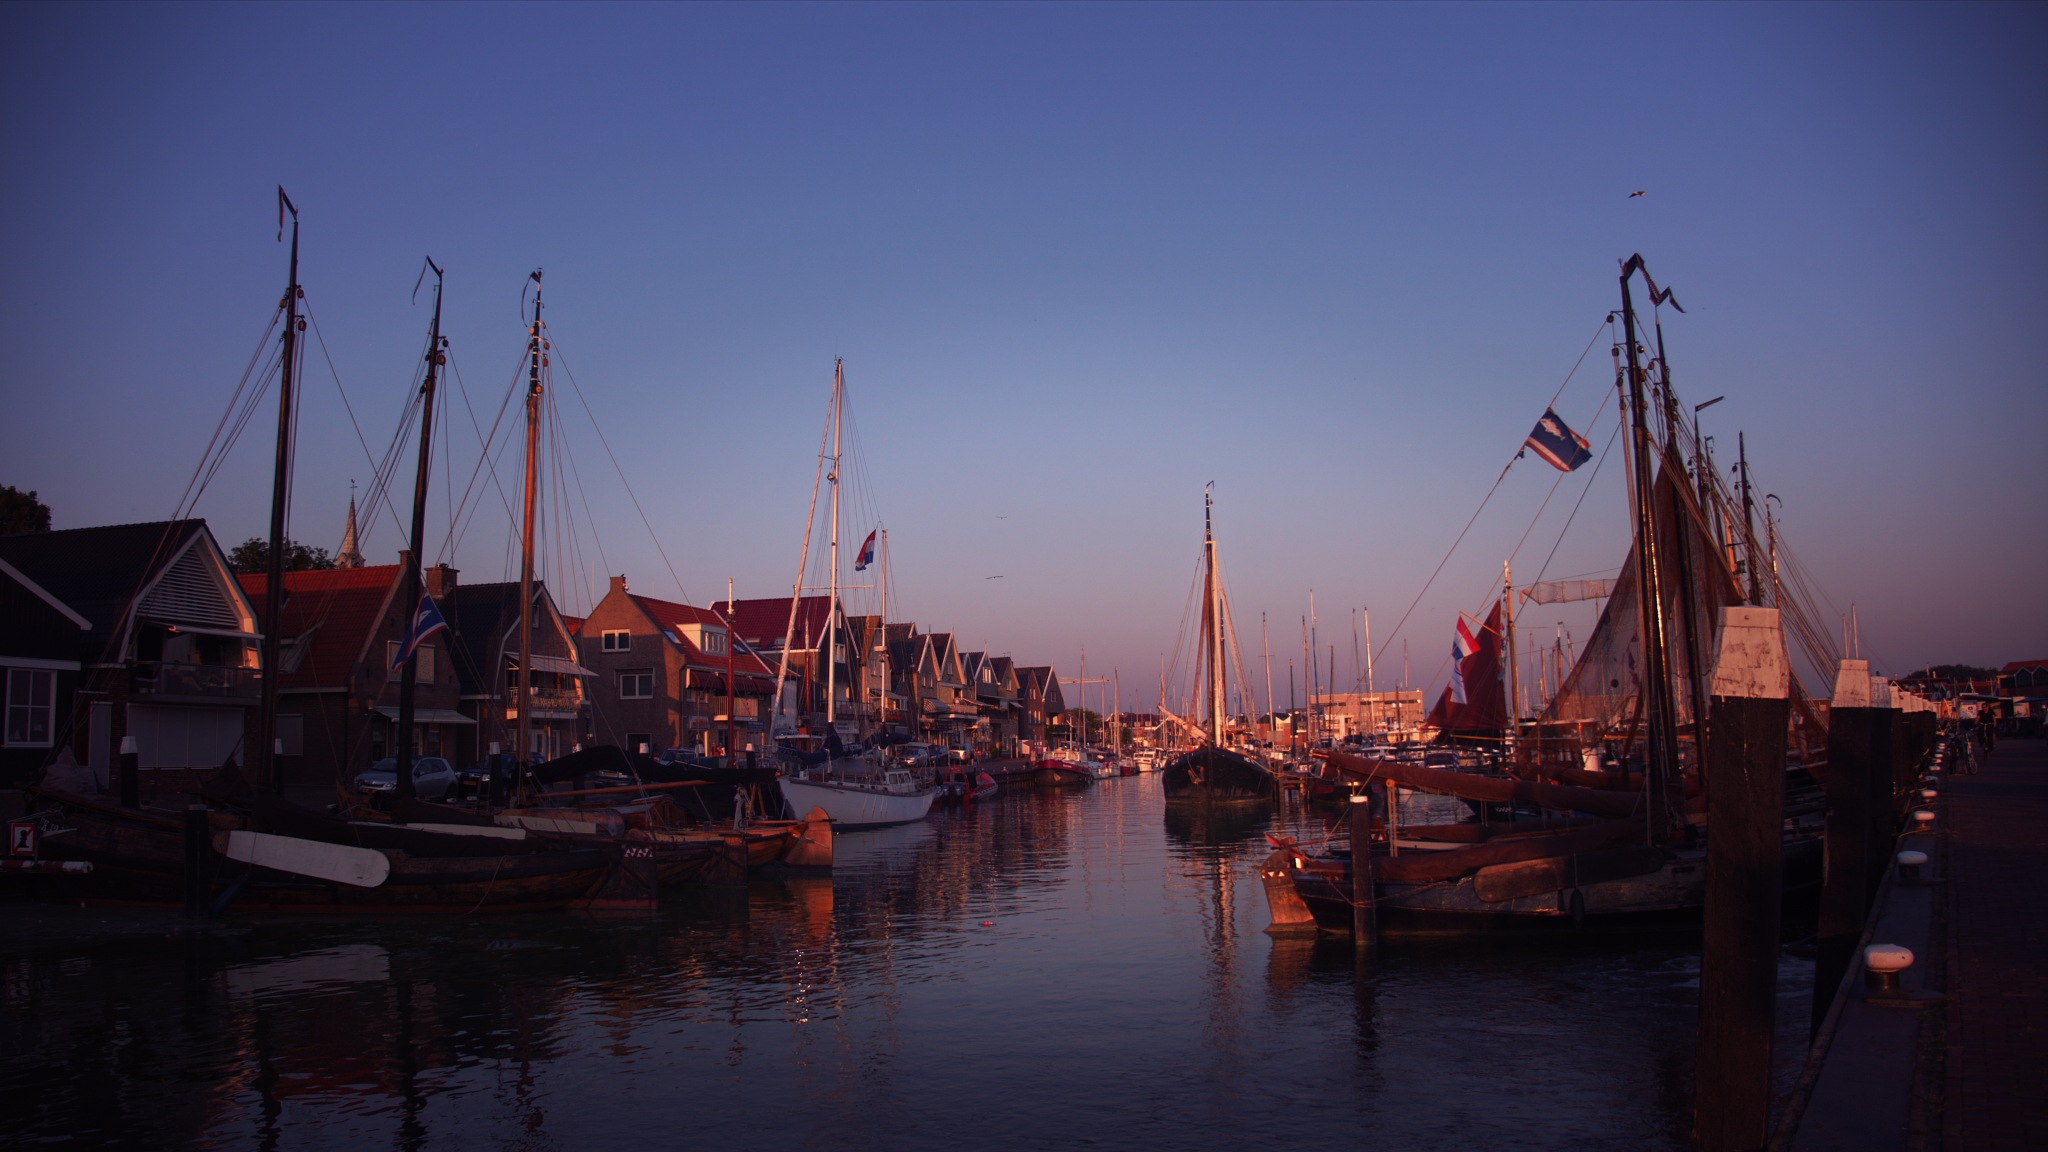 Pier by JonathanDanette